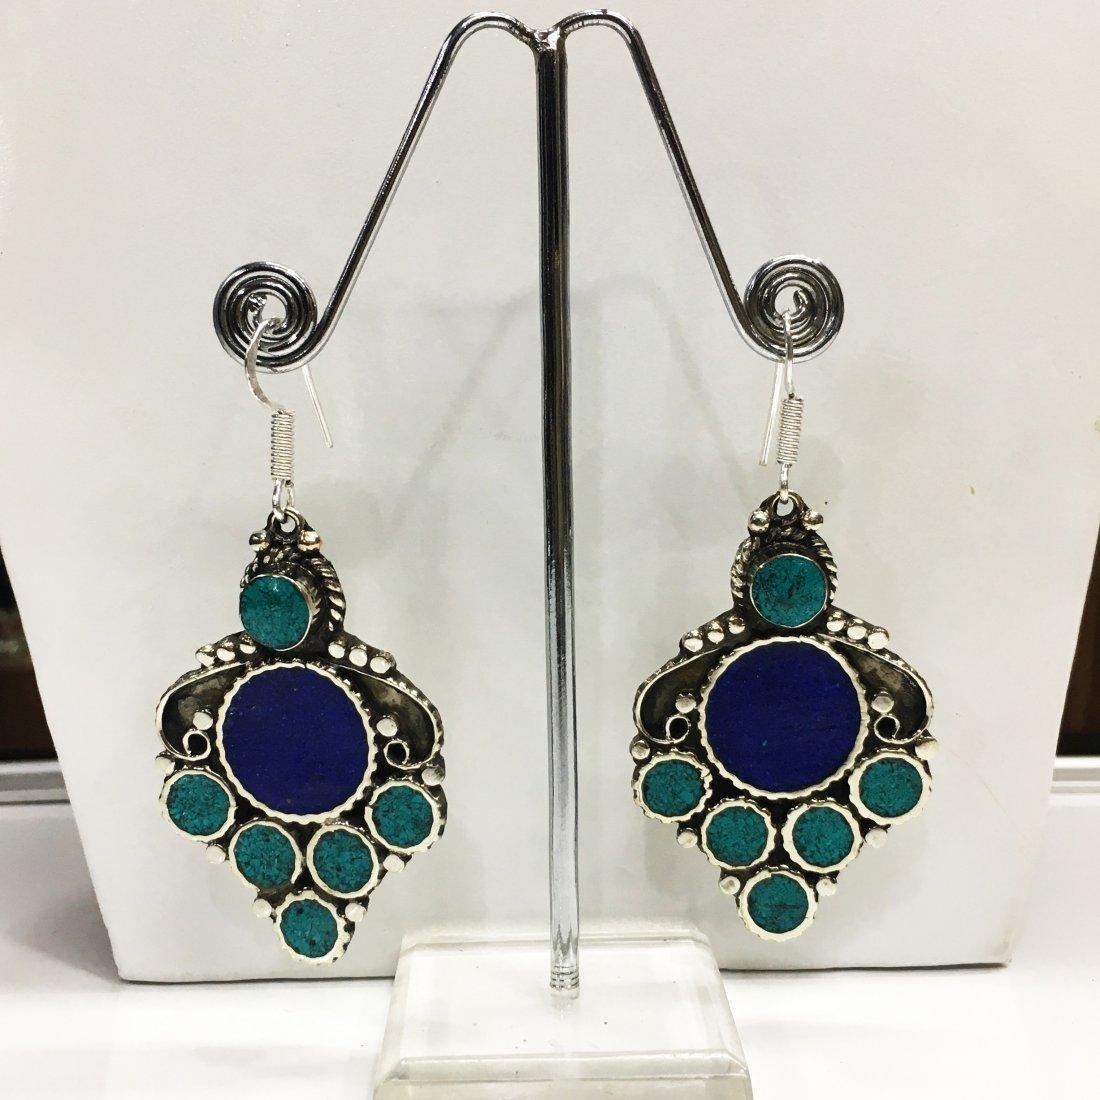 Traditional Vintage Turquoise & Lapis Handmade Earring